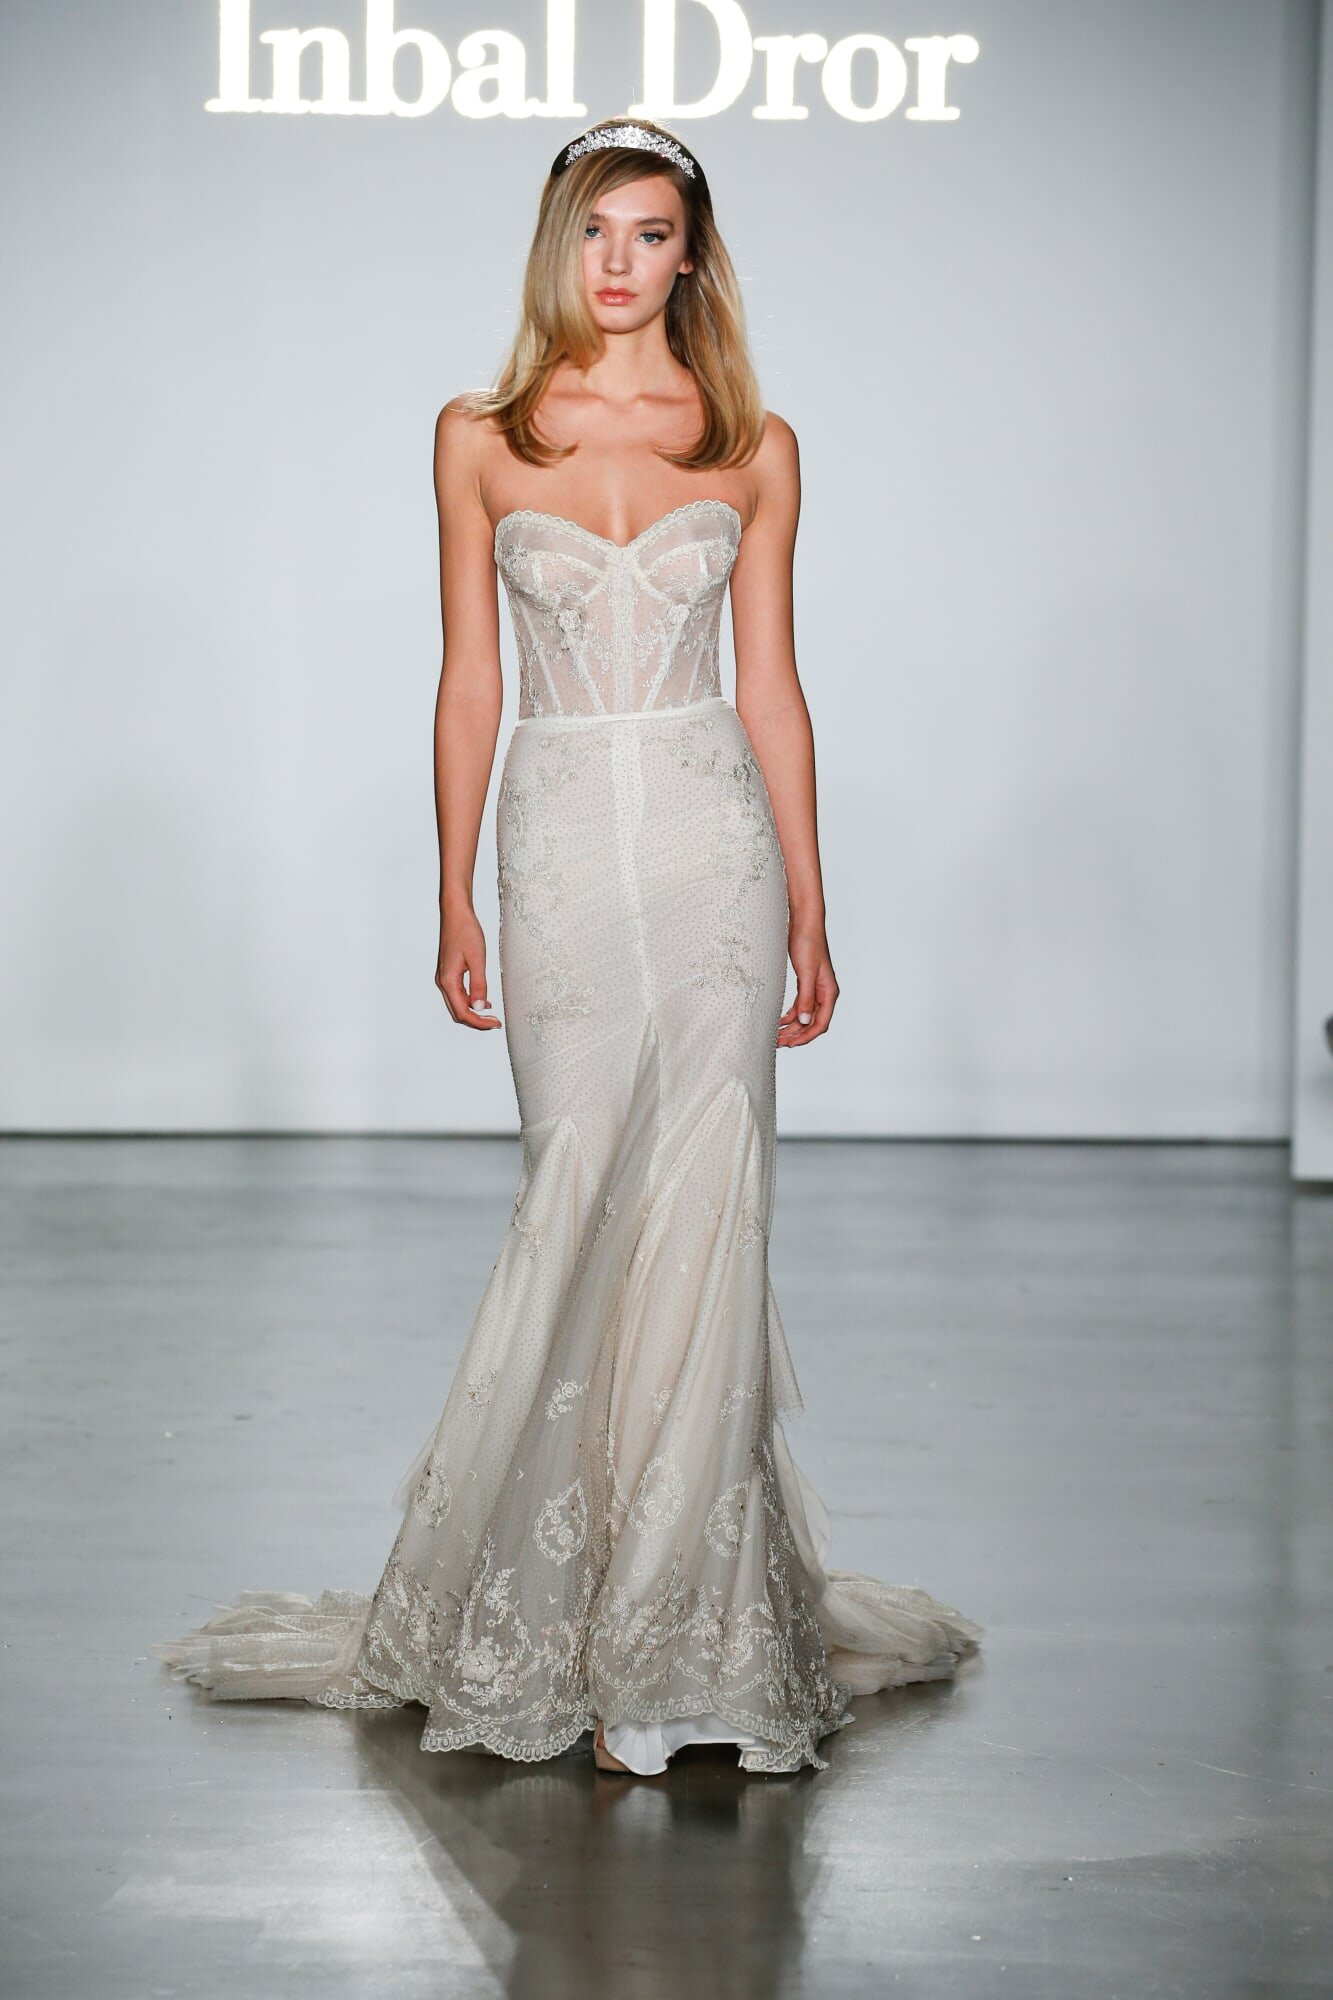 inbal-dror-bridal-fall-2020-corset-wedding-dress.jpg